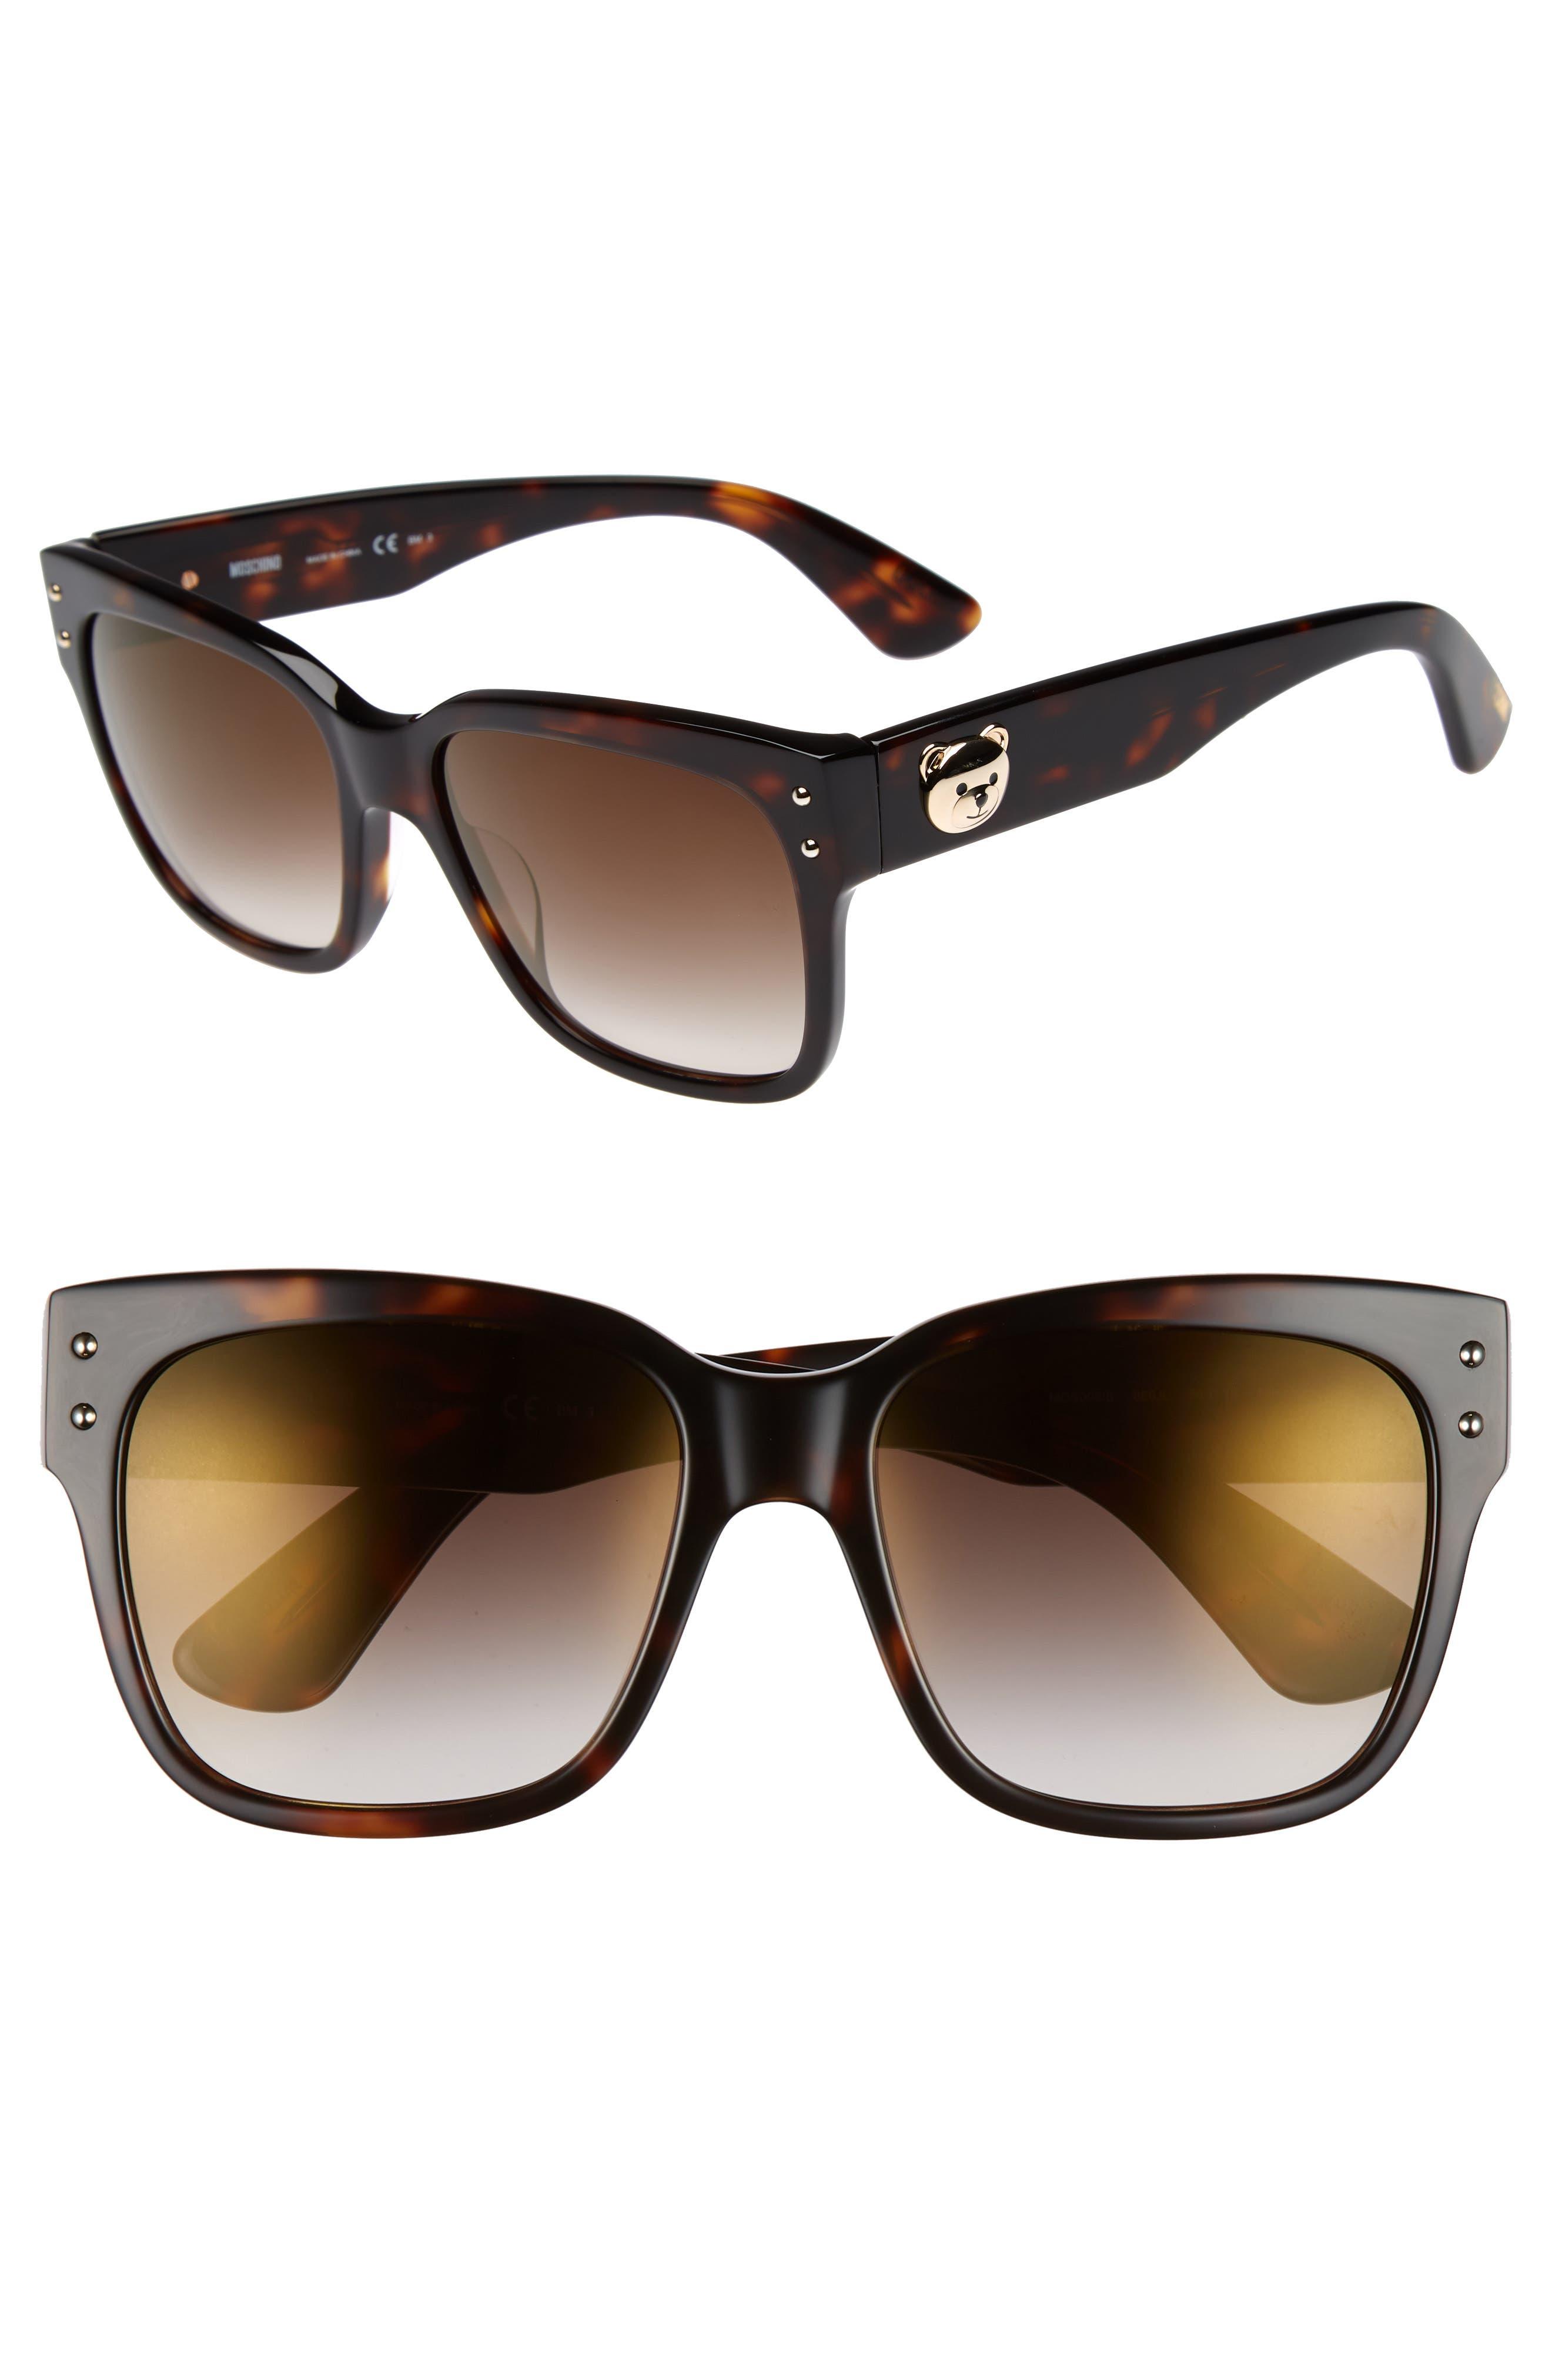 56mm Gradient Lens Sunglasses,                             Main thumbnail 1, color,                             Dark Havana